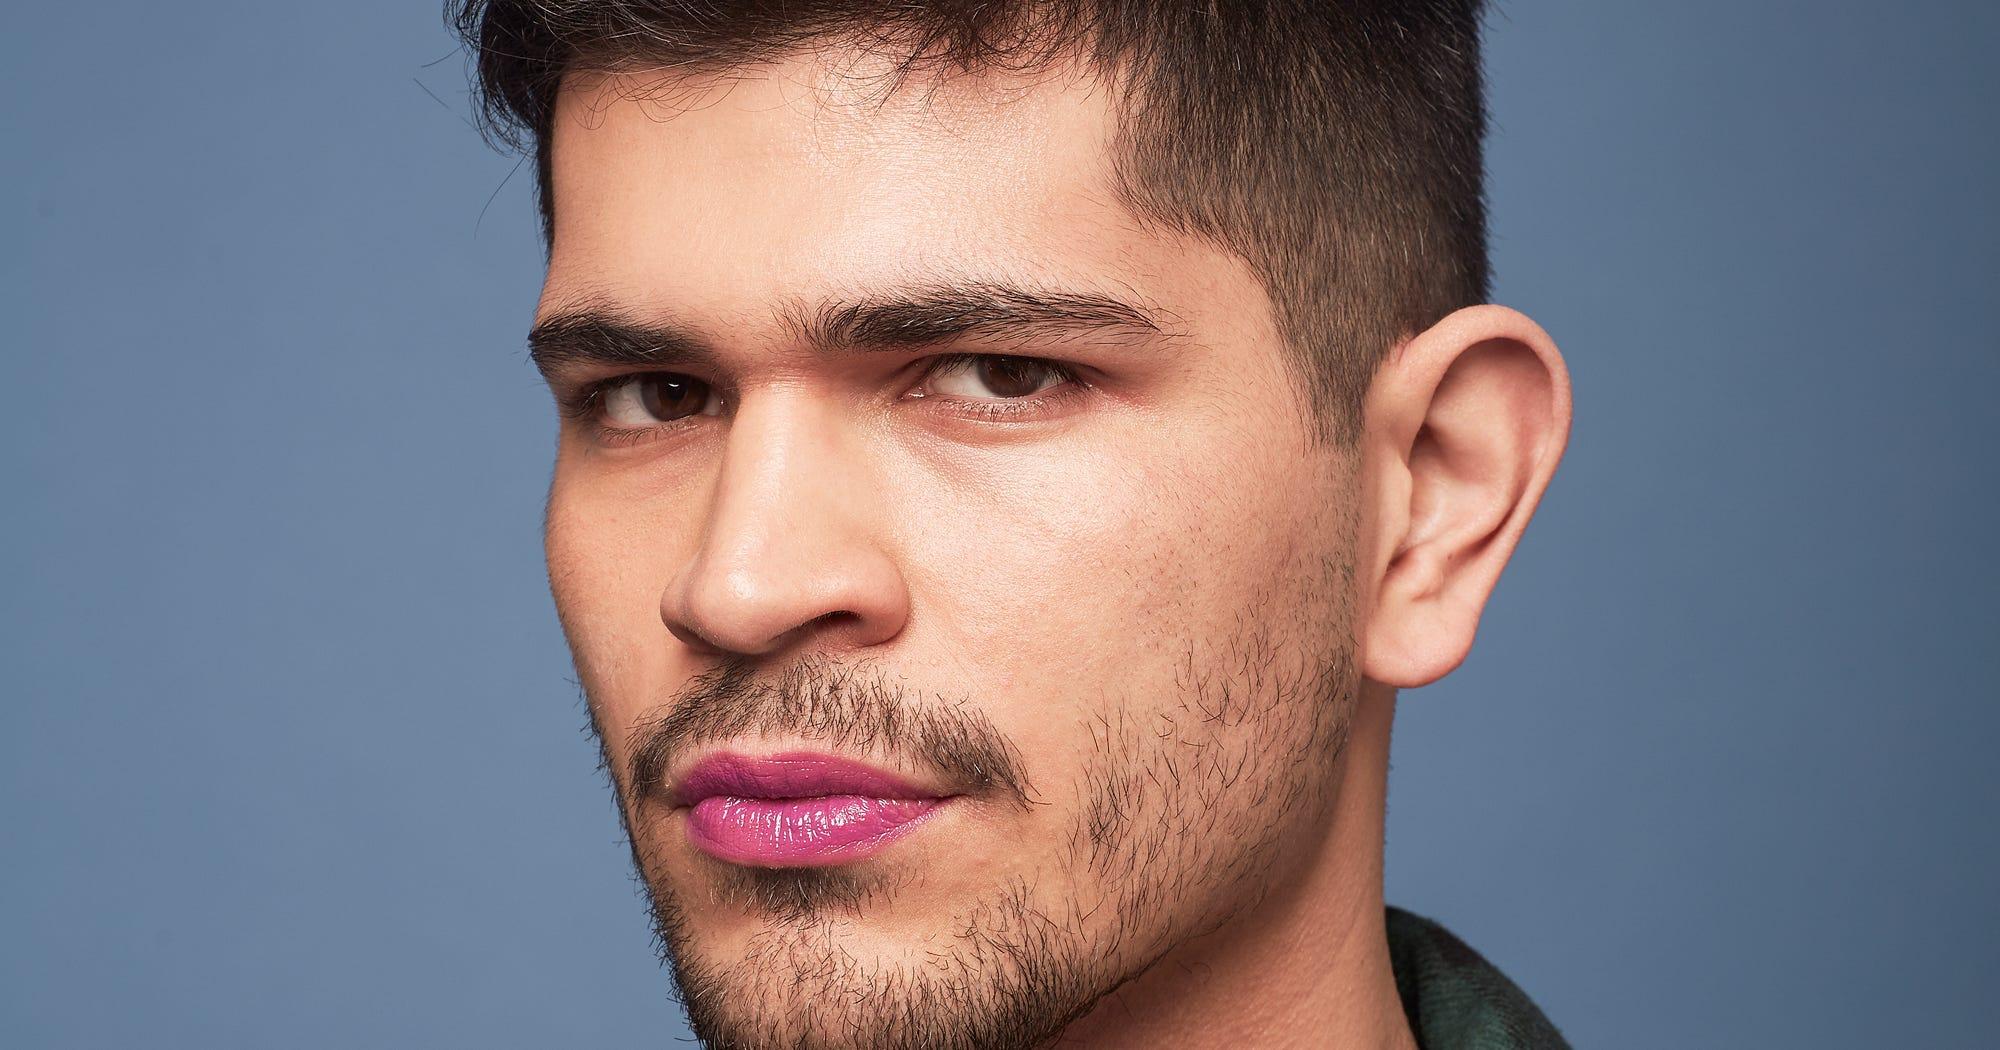 91368224dedf6 New Lipstick Trends On Male Models